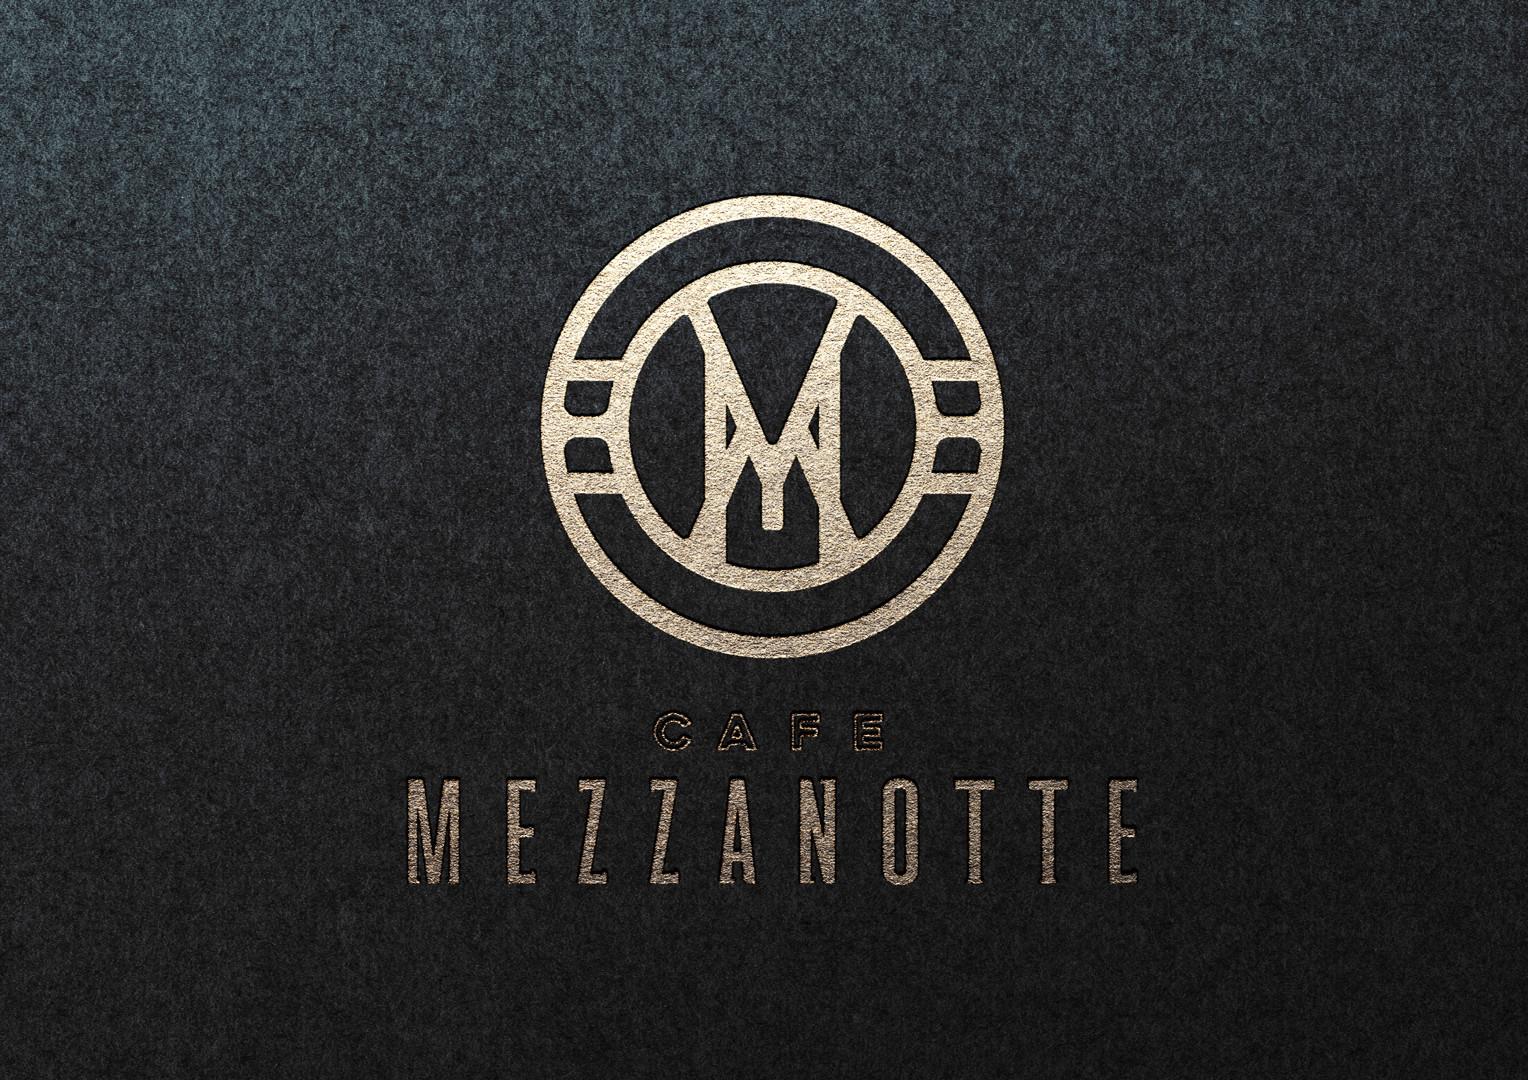 mezz-paper.jpg